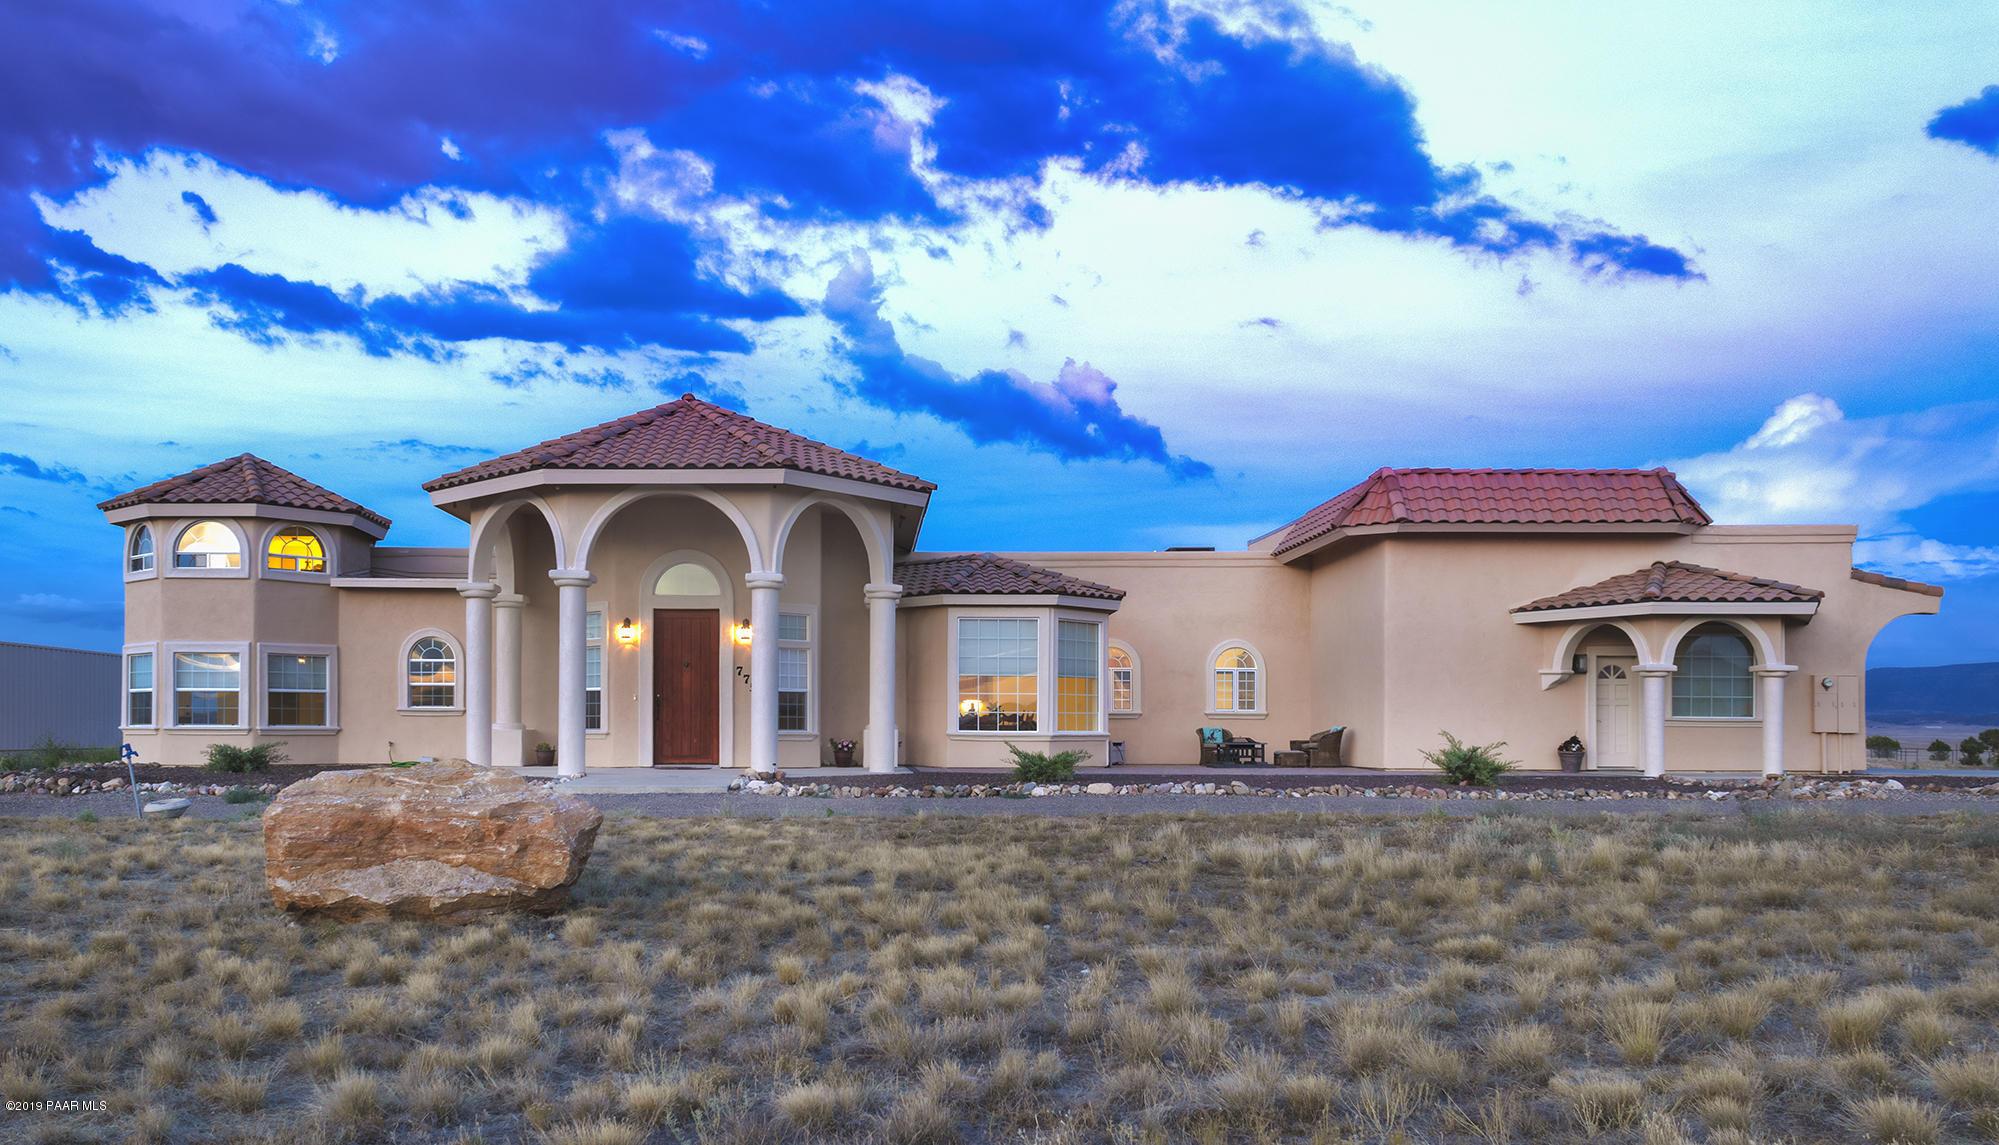 Photo of 775 Nick, Chino Valley, AZ 86323